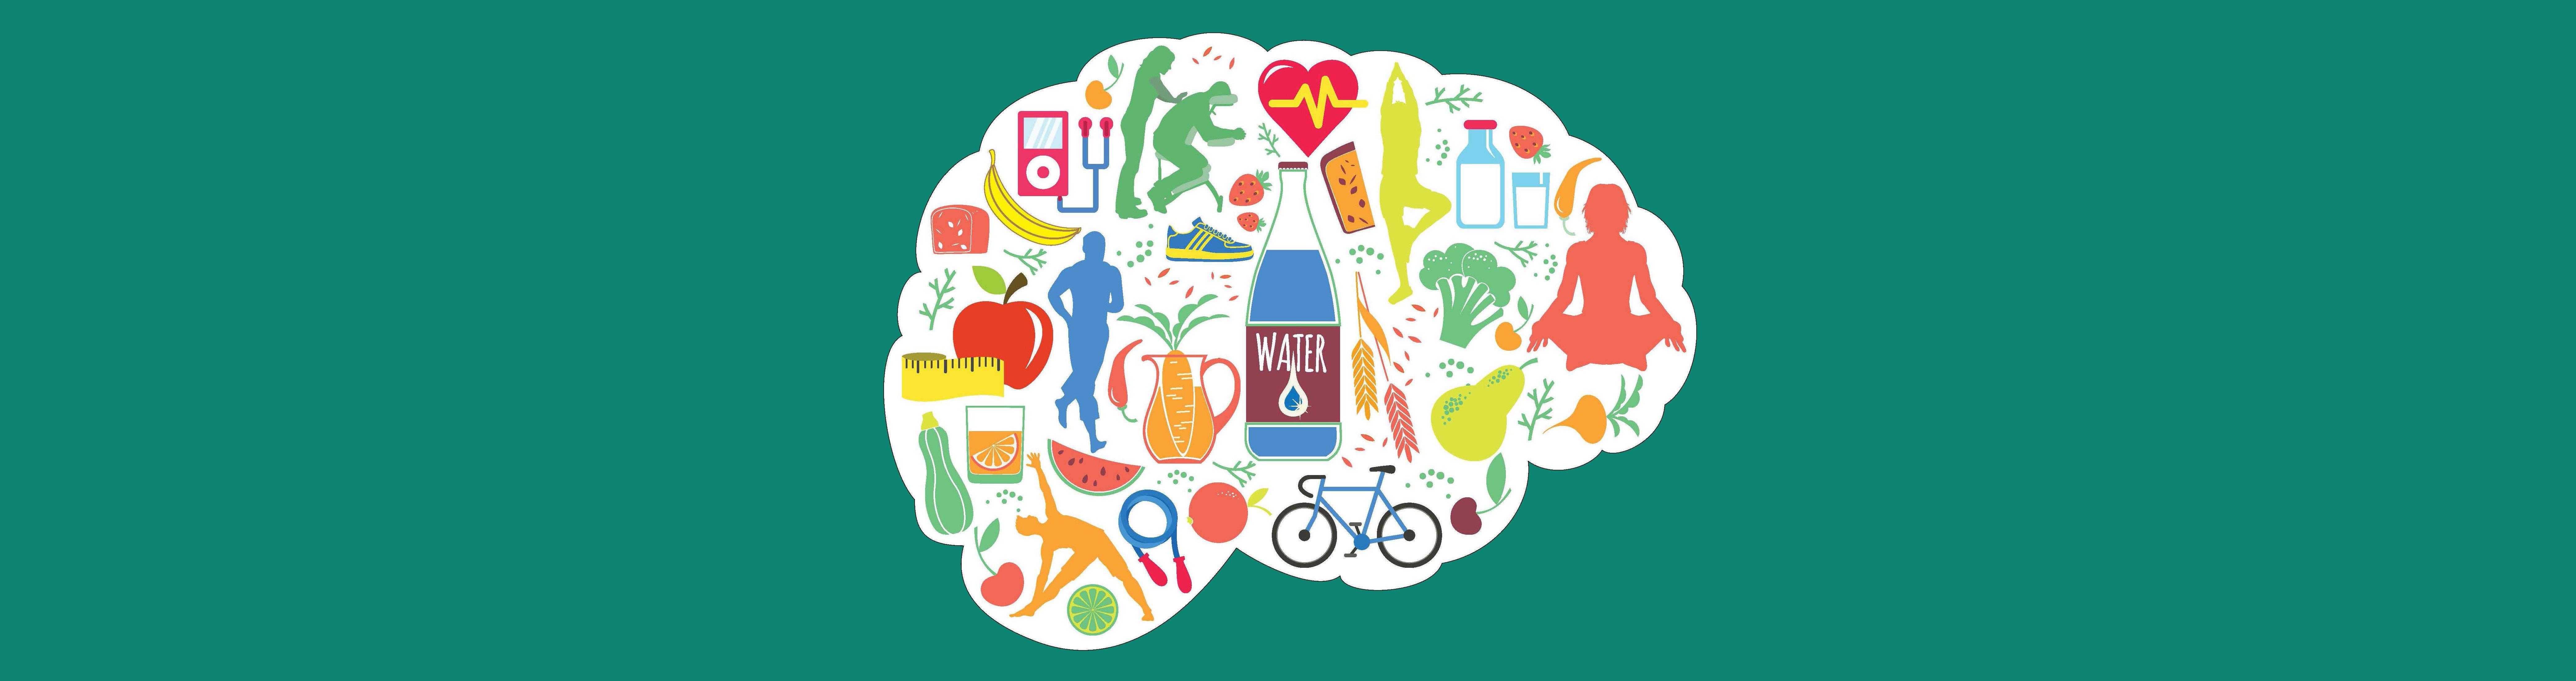 The Mind Matters brain logo